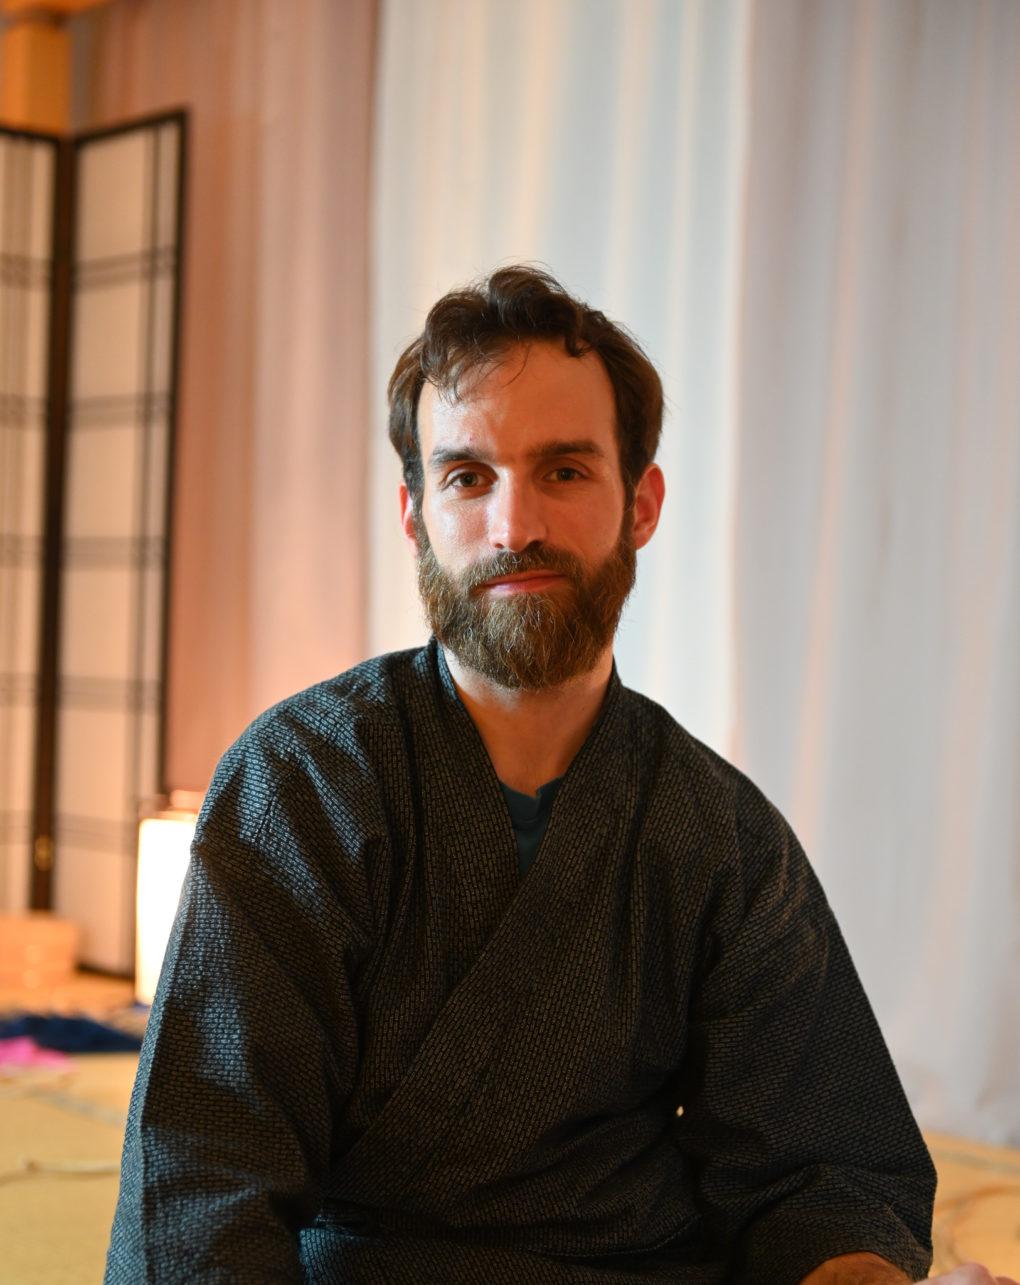 Harukumo, seit 2005 aktiver Shibari-Lehrer.